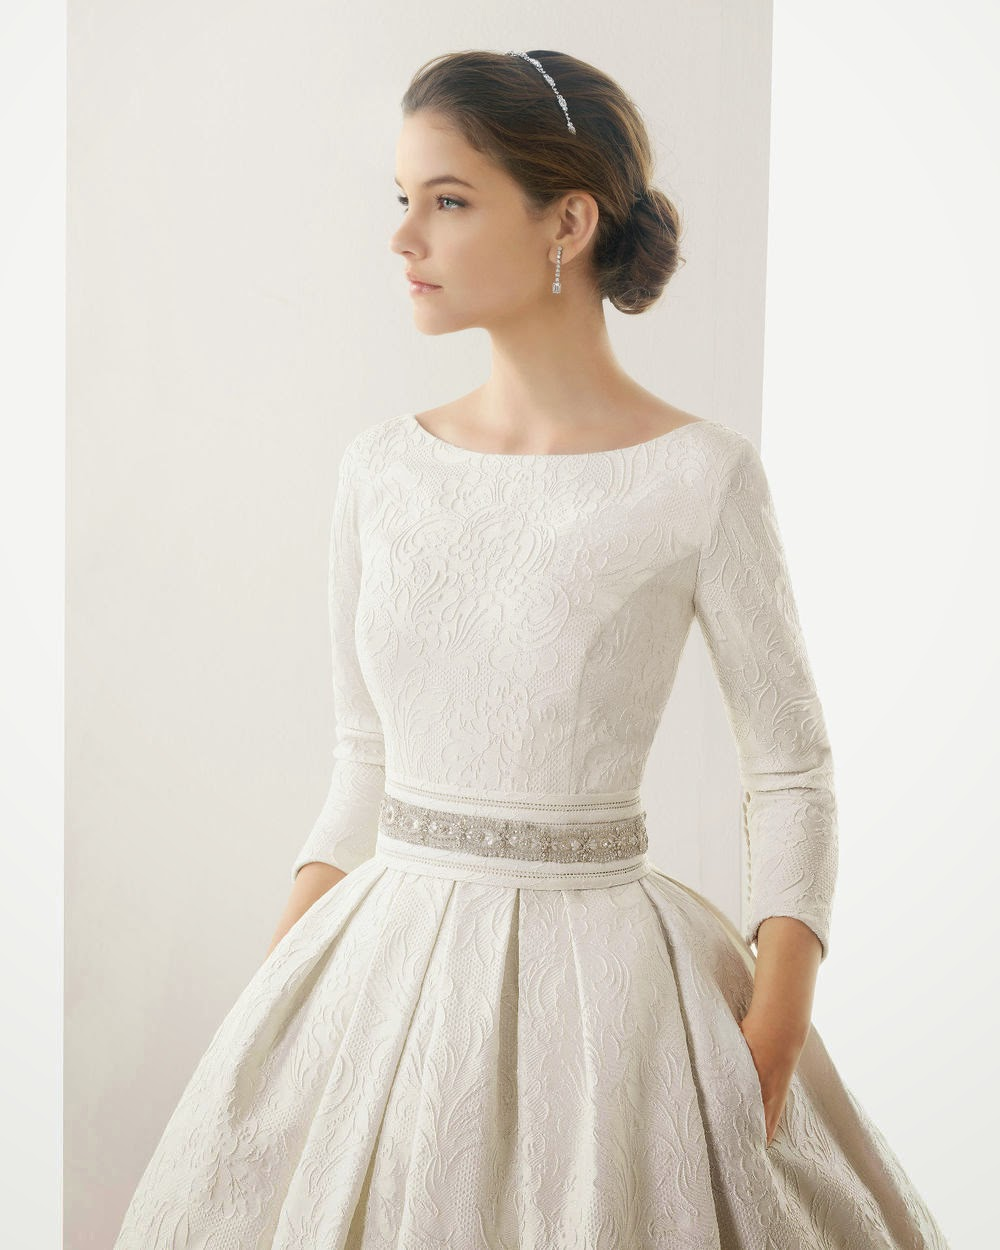 Brides & Bridesmaids Fashion: Those Style Wedding Dresses